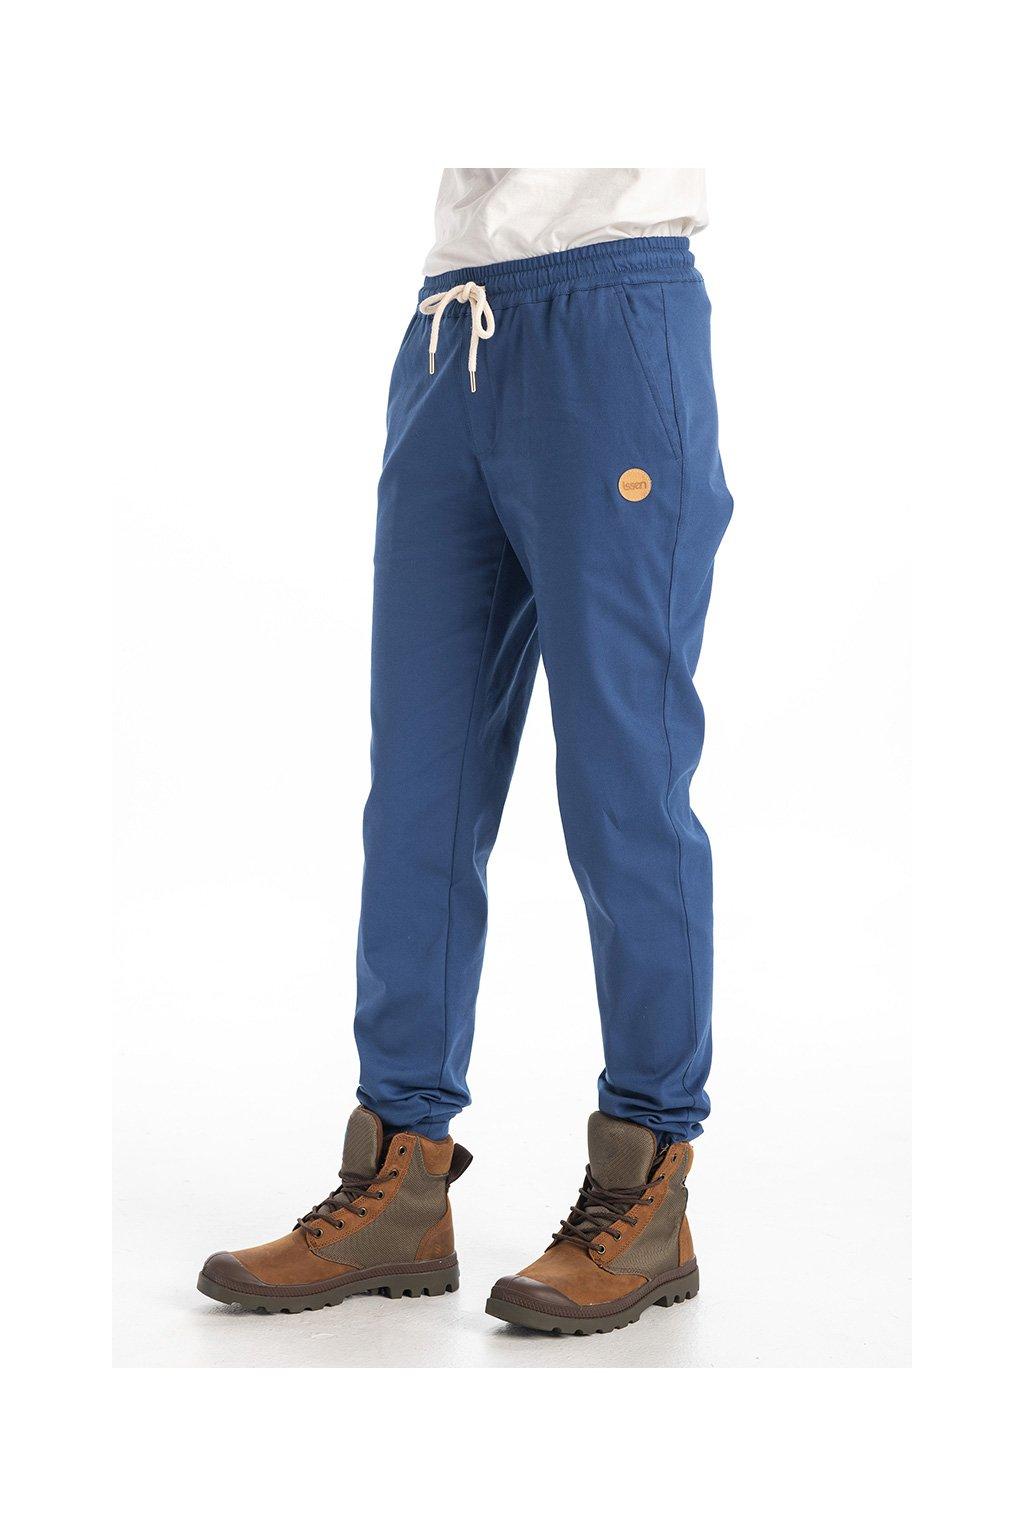 Kalhoty jogger SJRP 80 1